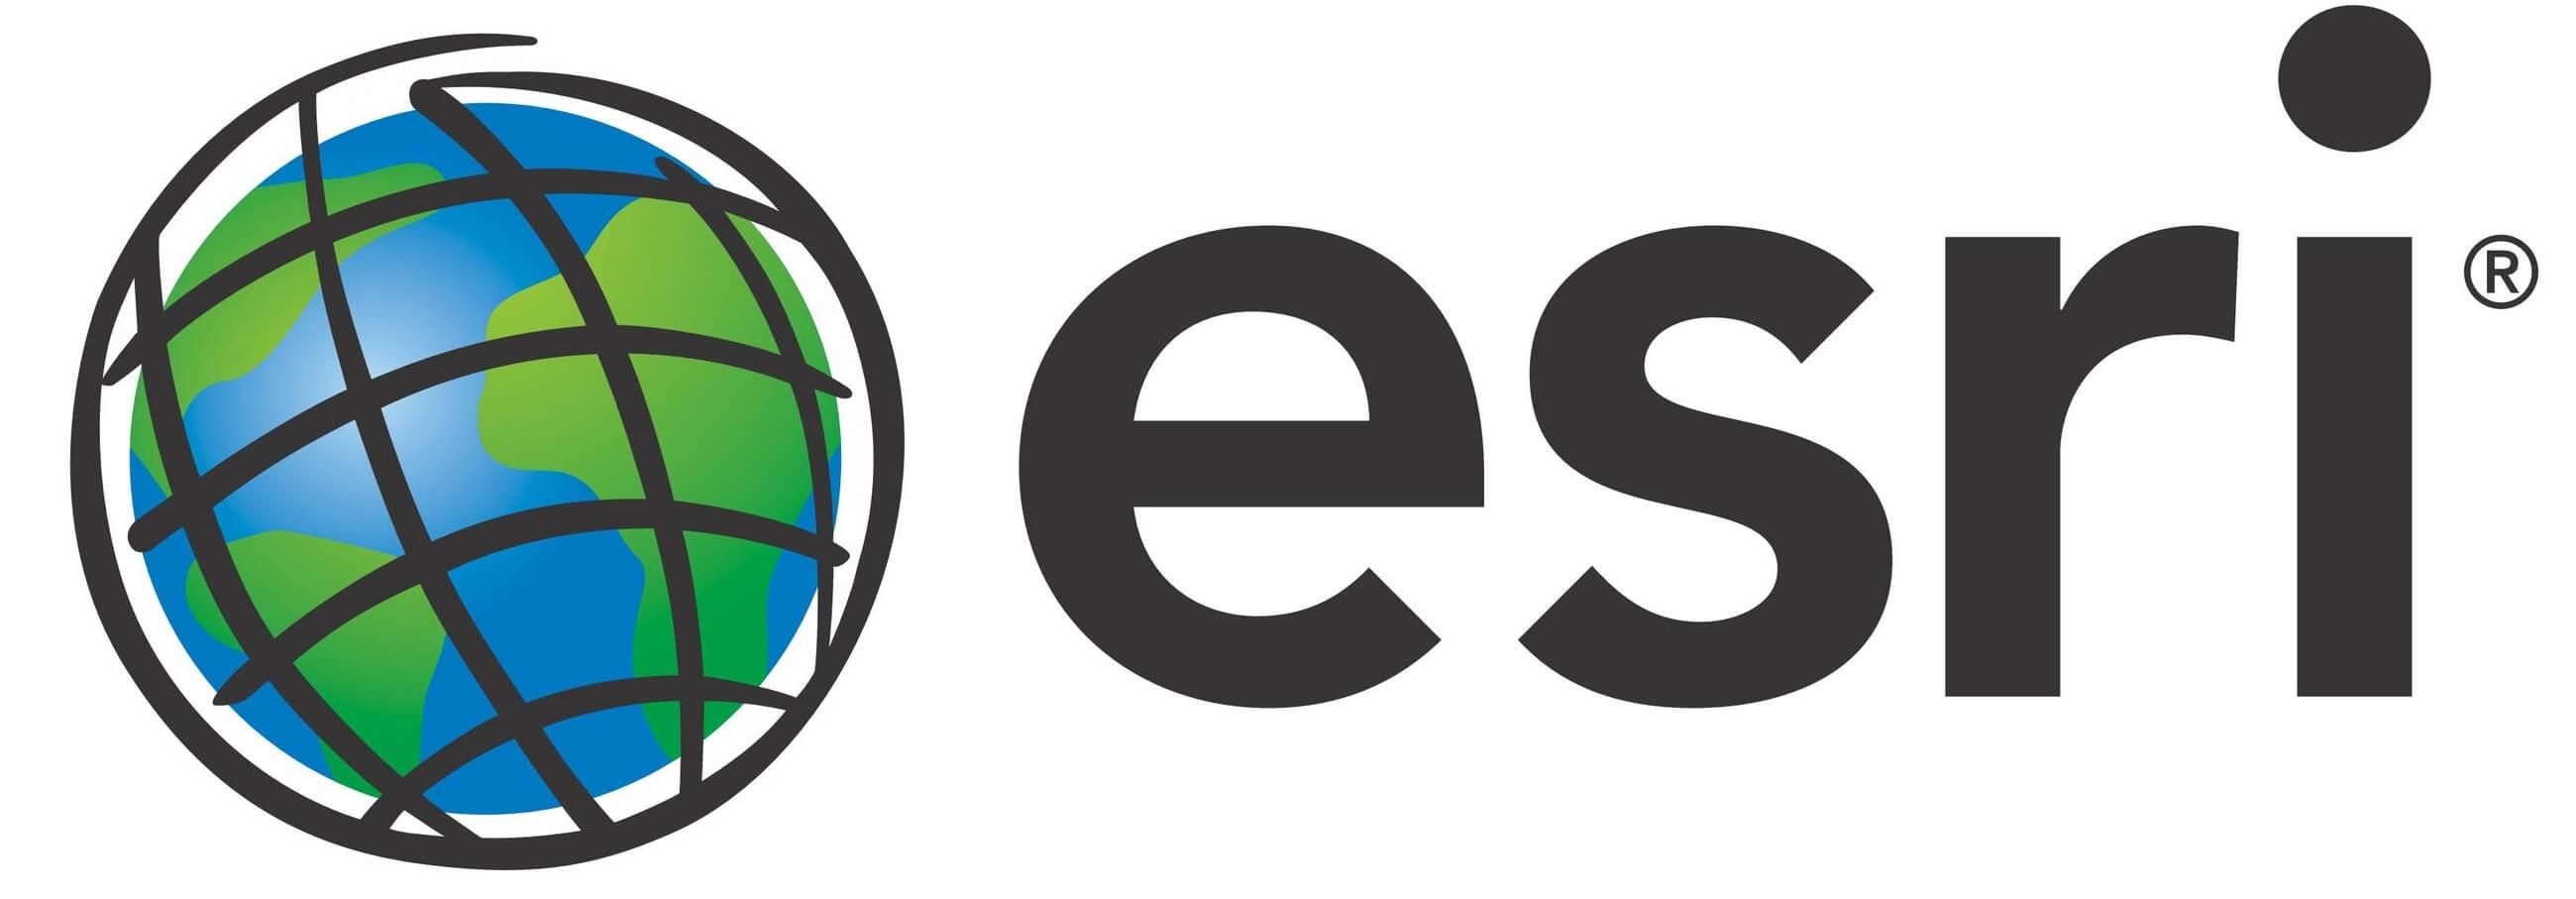 Esri Logo [JPG] png